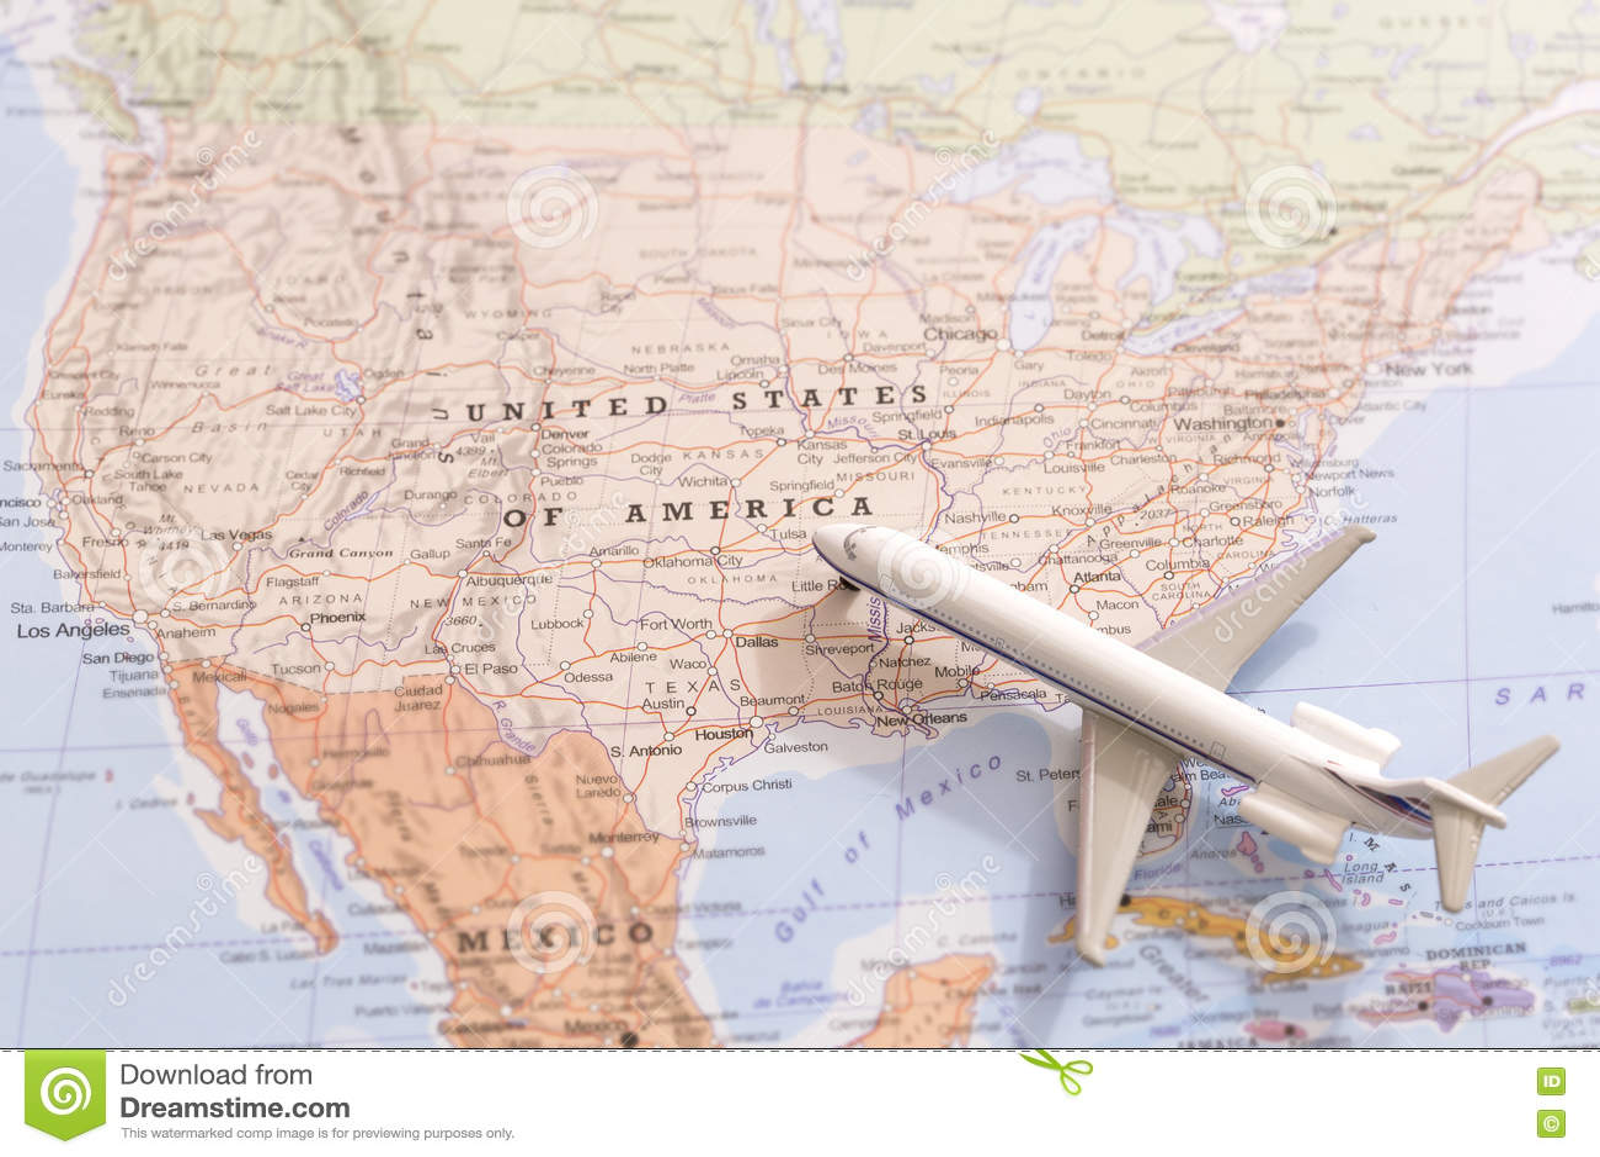 Reiseziel Usa Passagierflugzeugminiatur Auf Einer Karte Stockfoto